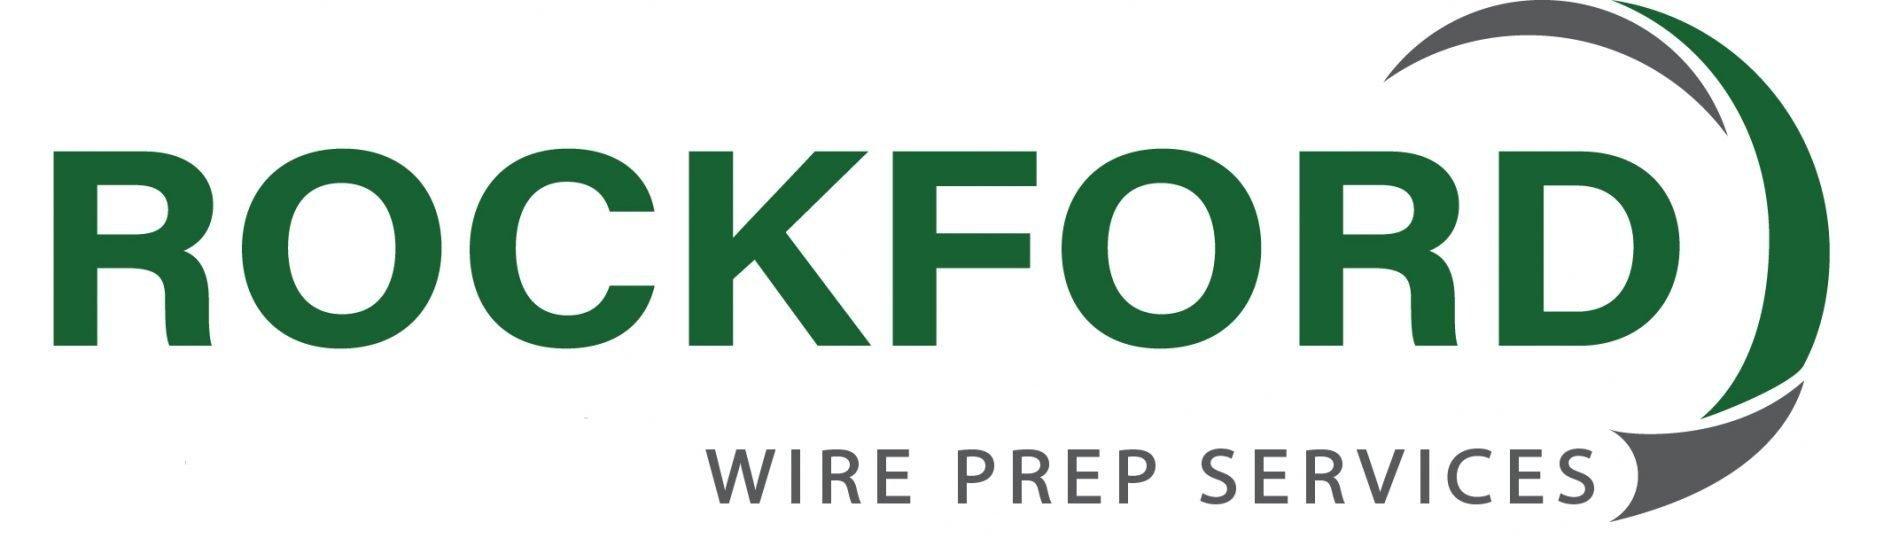 Rockford Wire Preparation Services